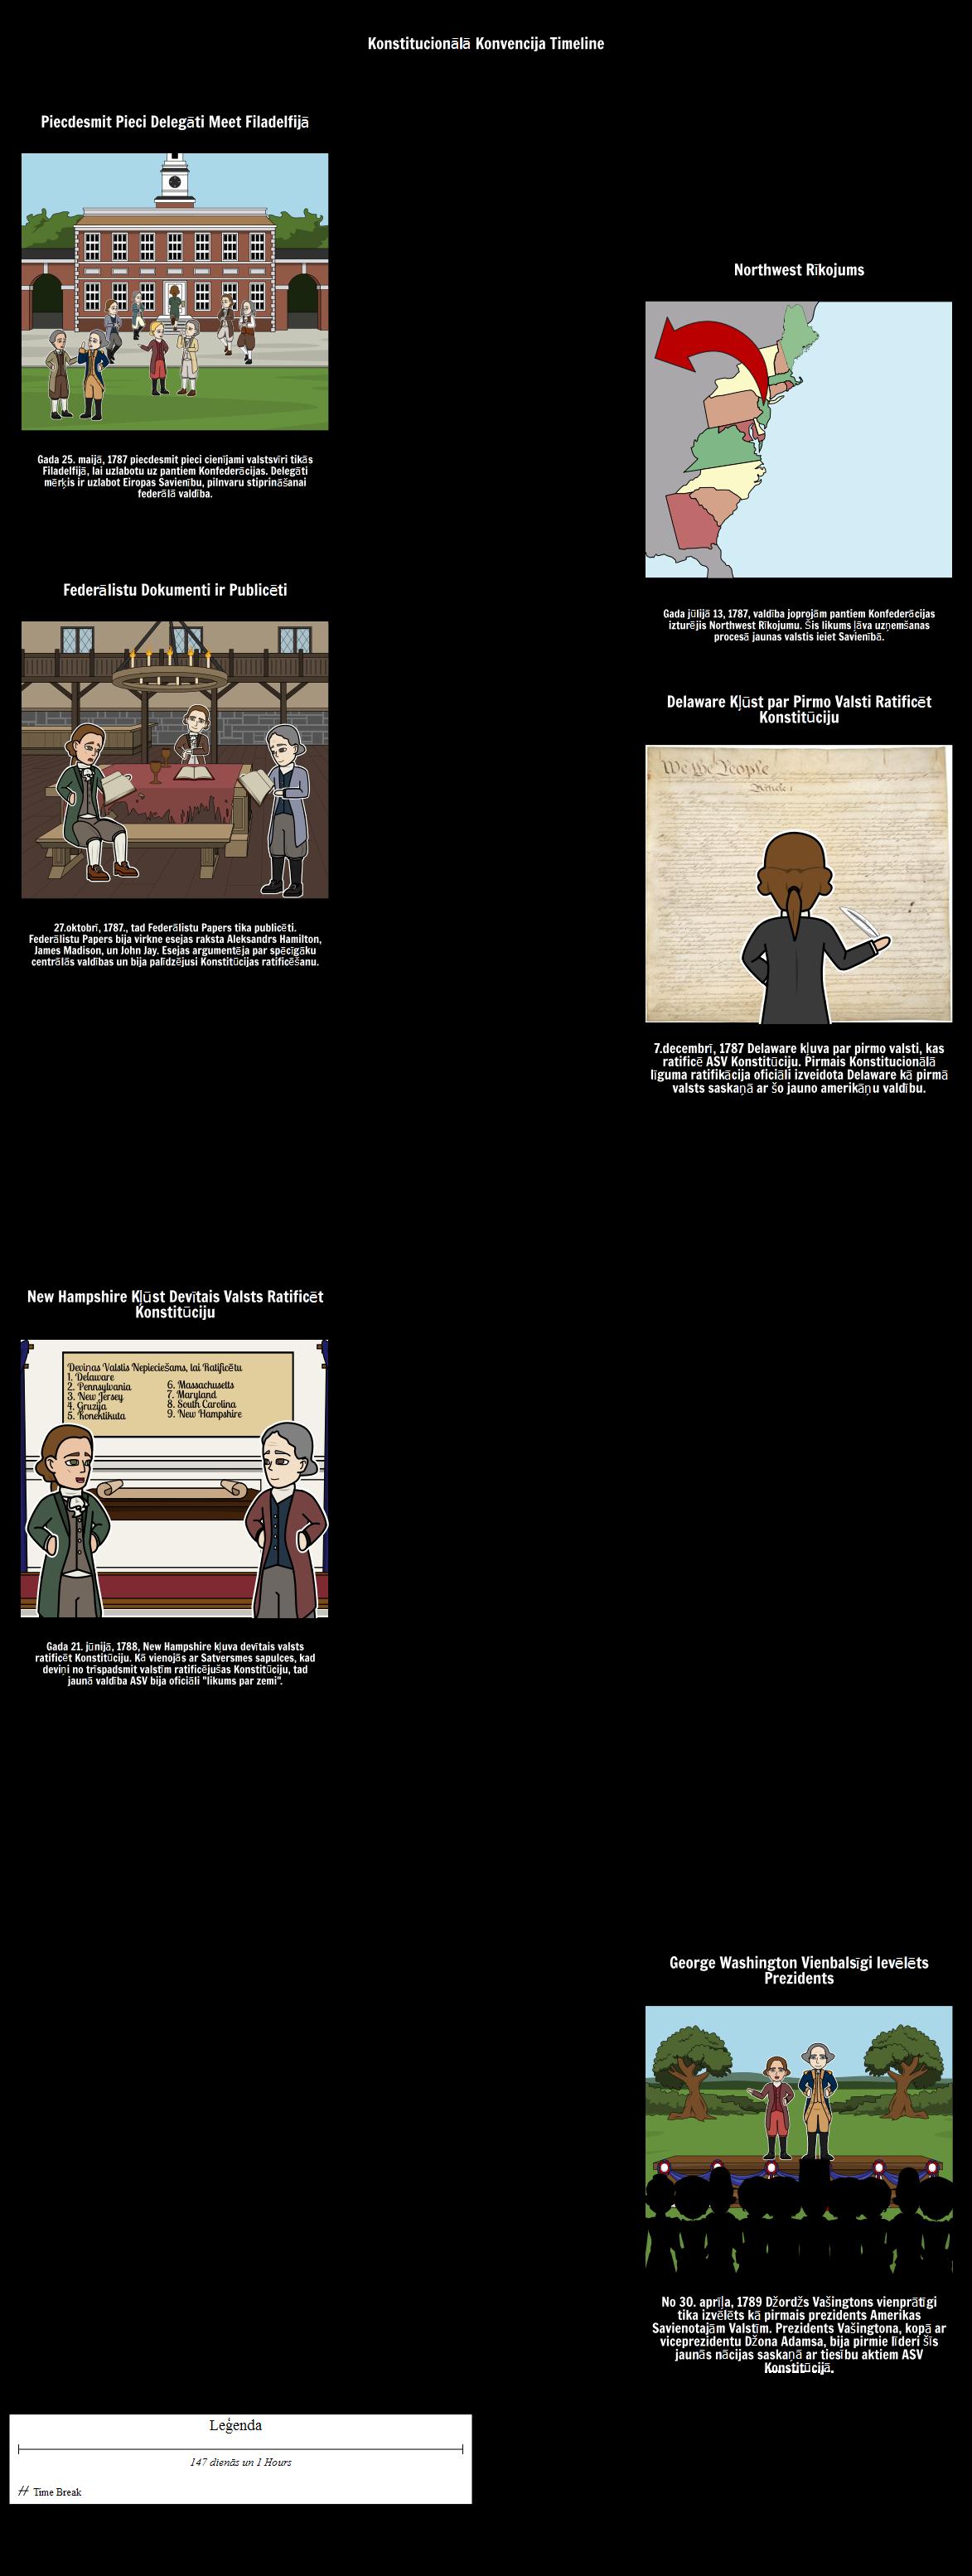 Satversmes Sapulces Timeline